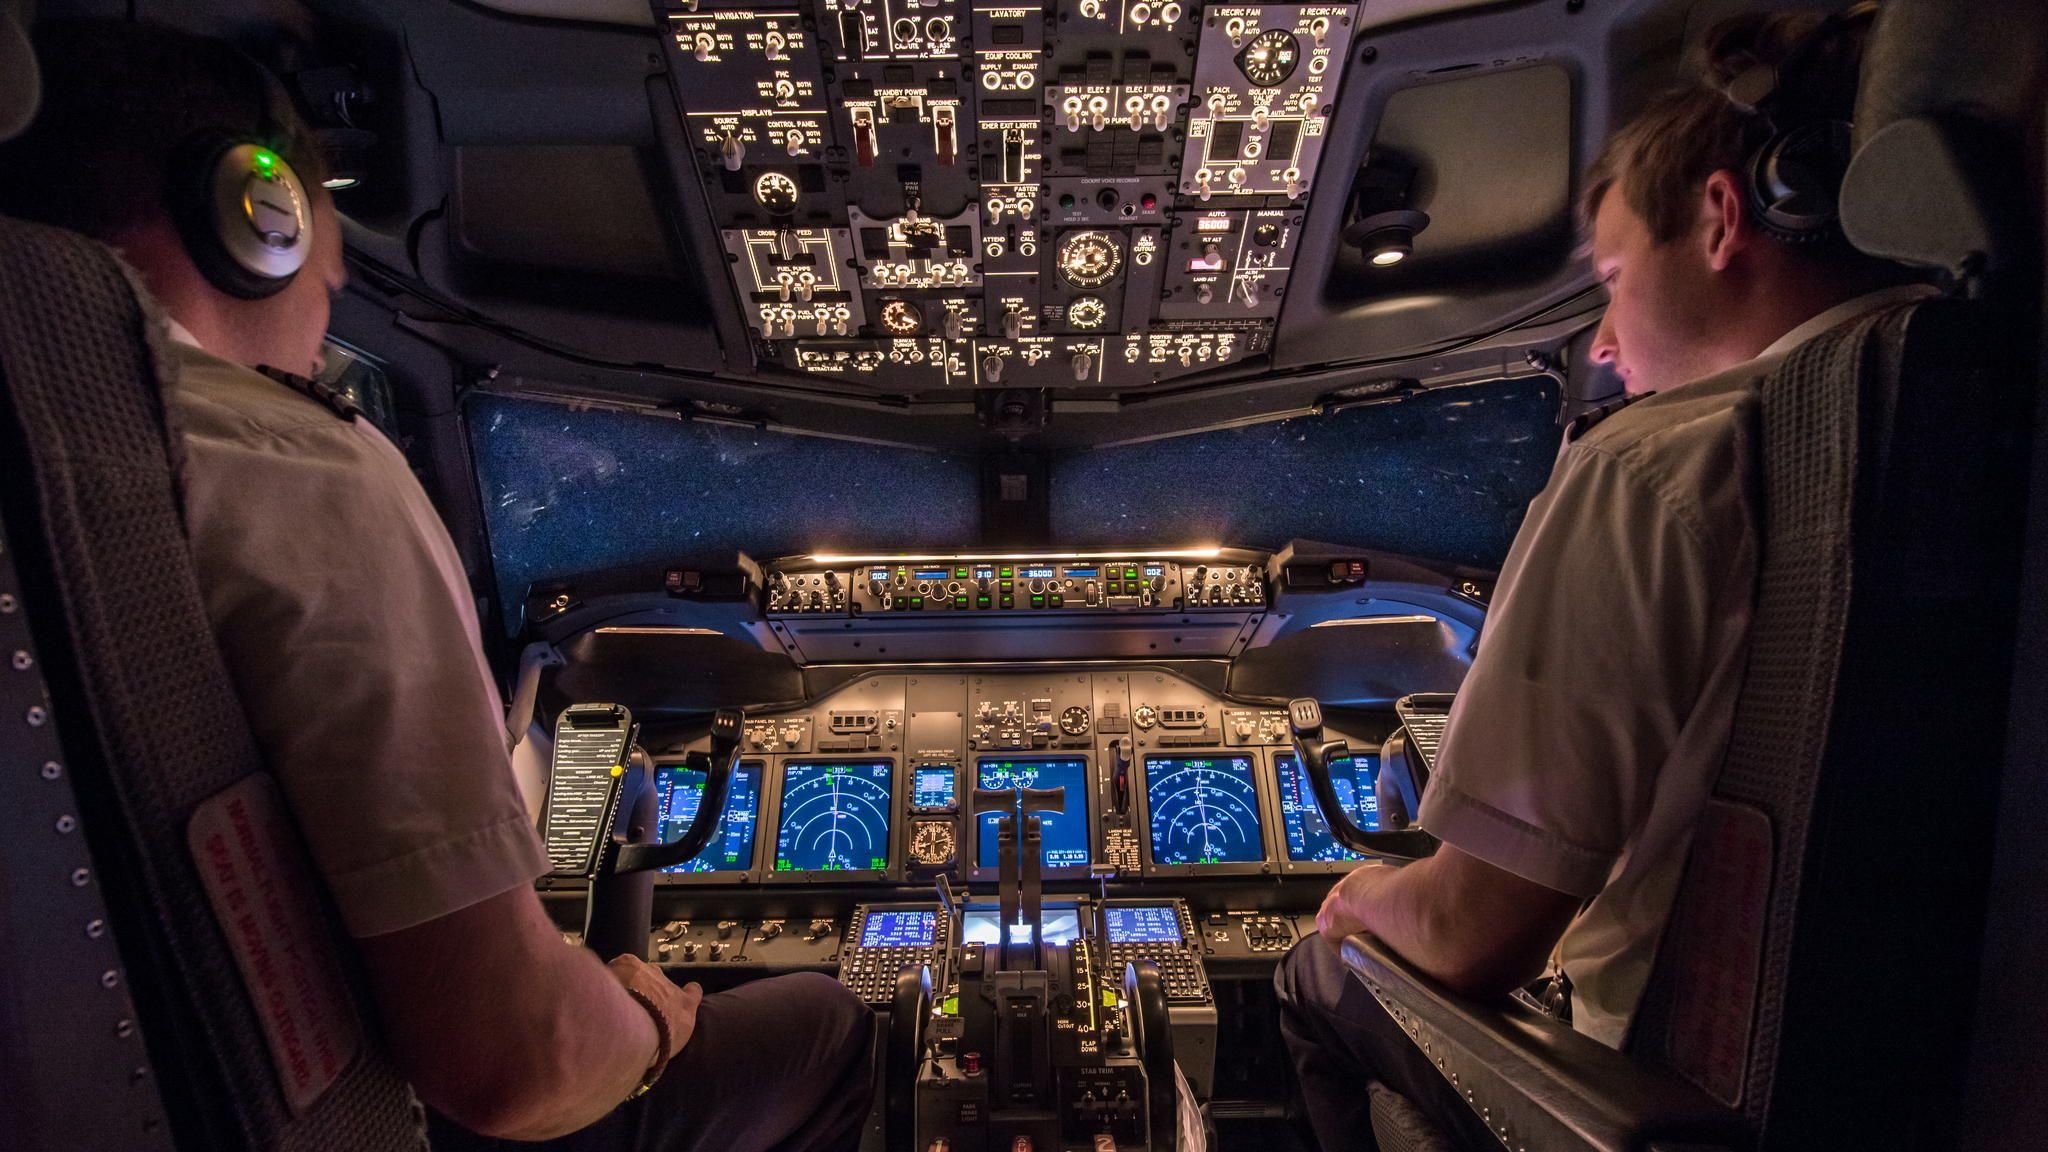 Starry night at 36.000 feet by Martijn Kort on 500px